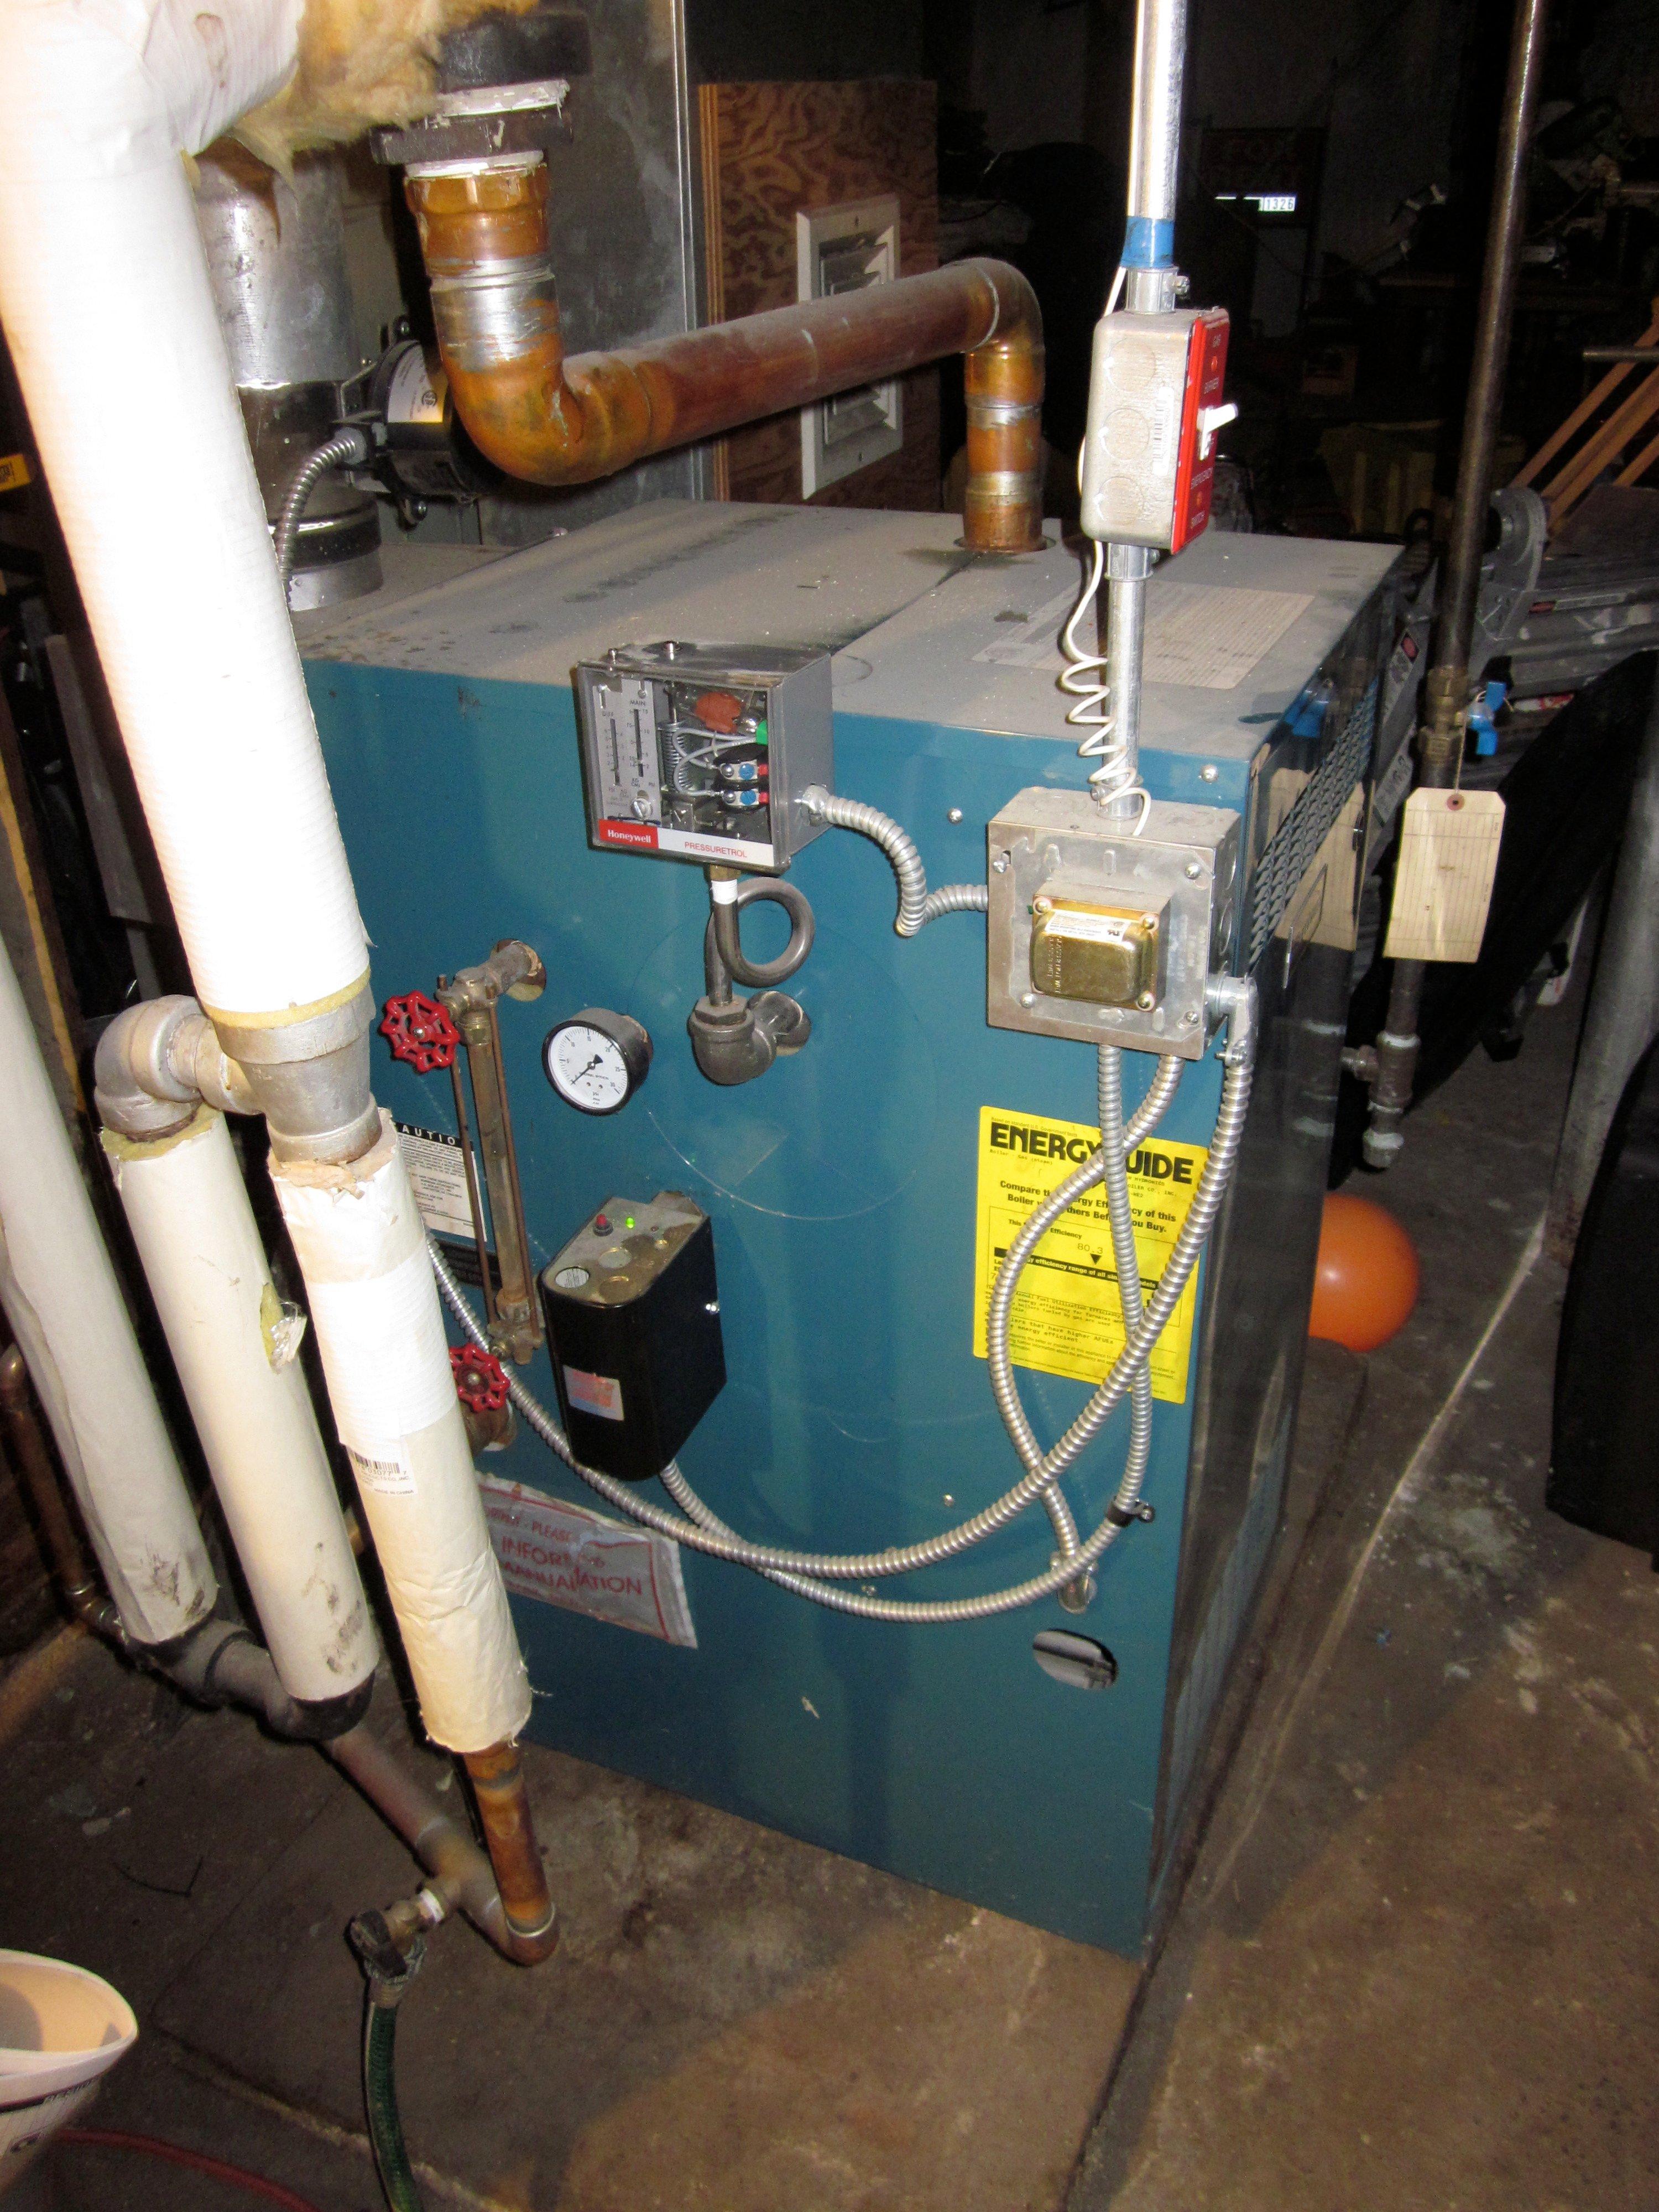 IMG_4280 pressuretrol setting on burnham heating help the wall honeywell pressuretrol wiring diagram at eliteediting.co